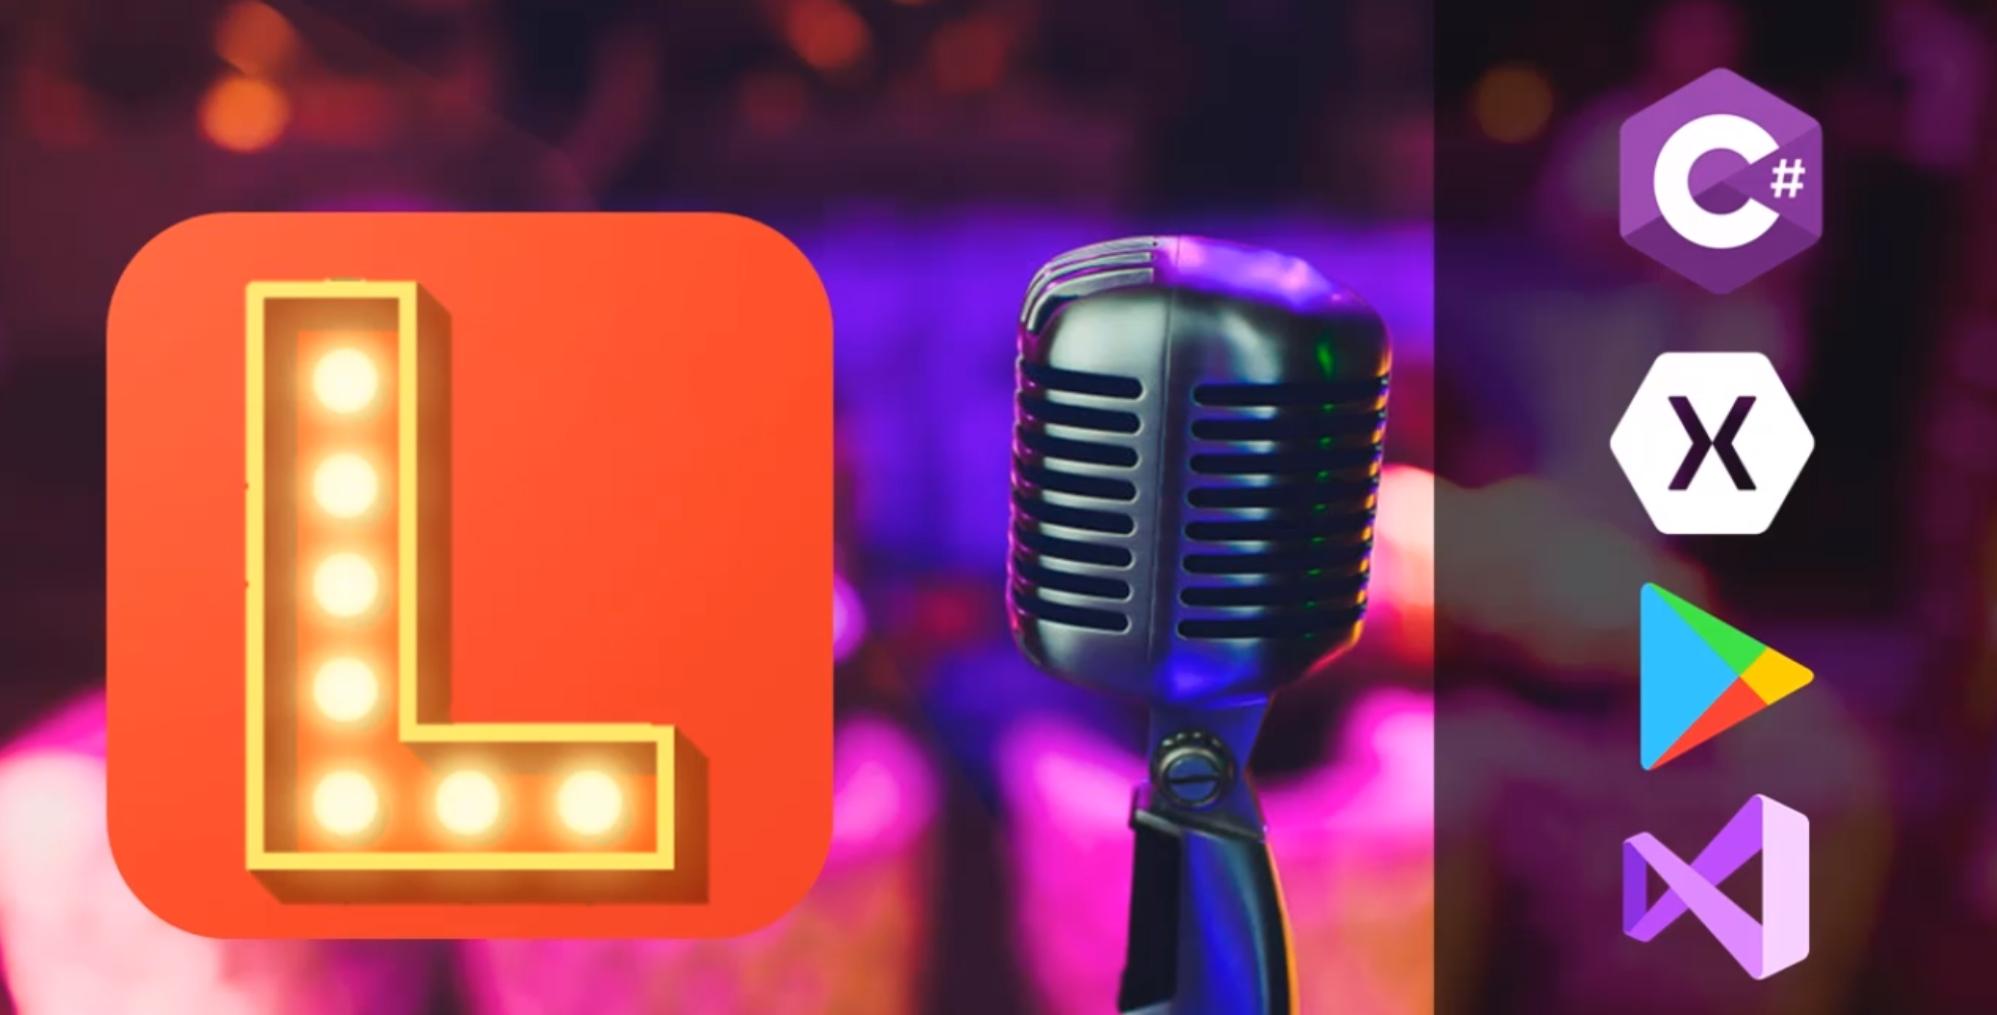 Curso gratis App android + Sistema para Karaoke en Xamarin Forms (2021) Español